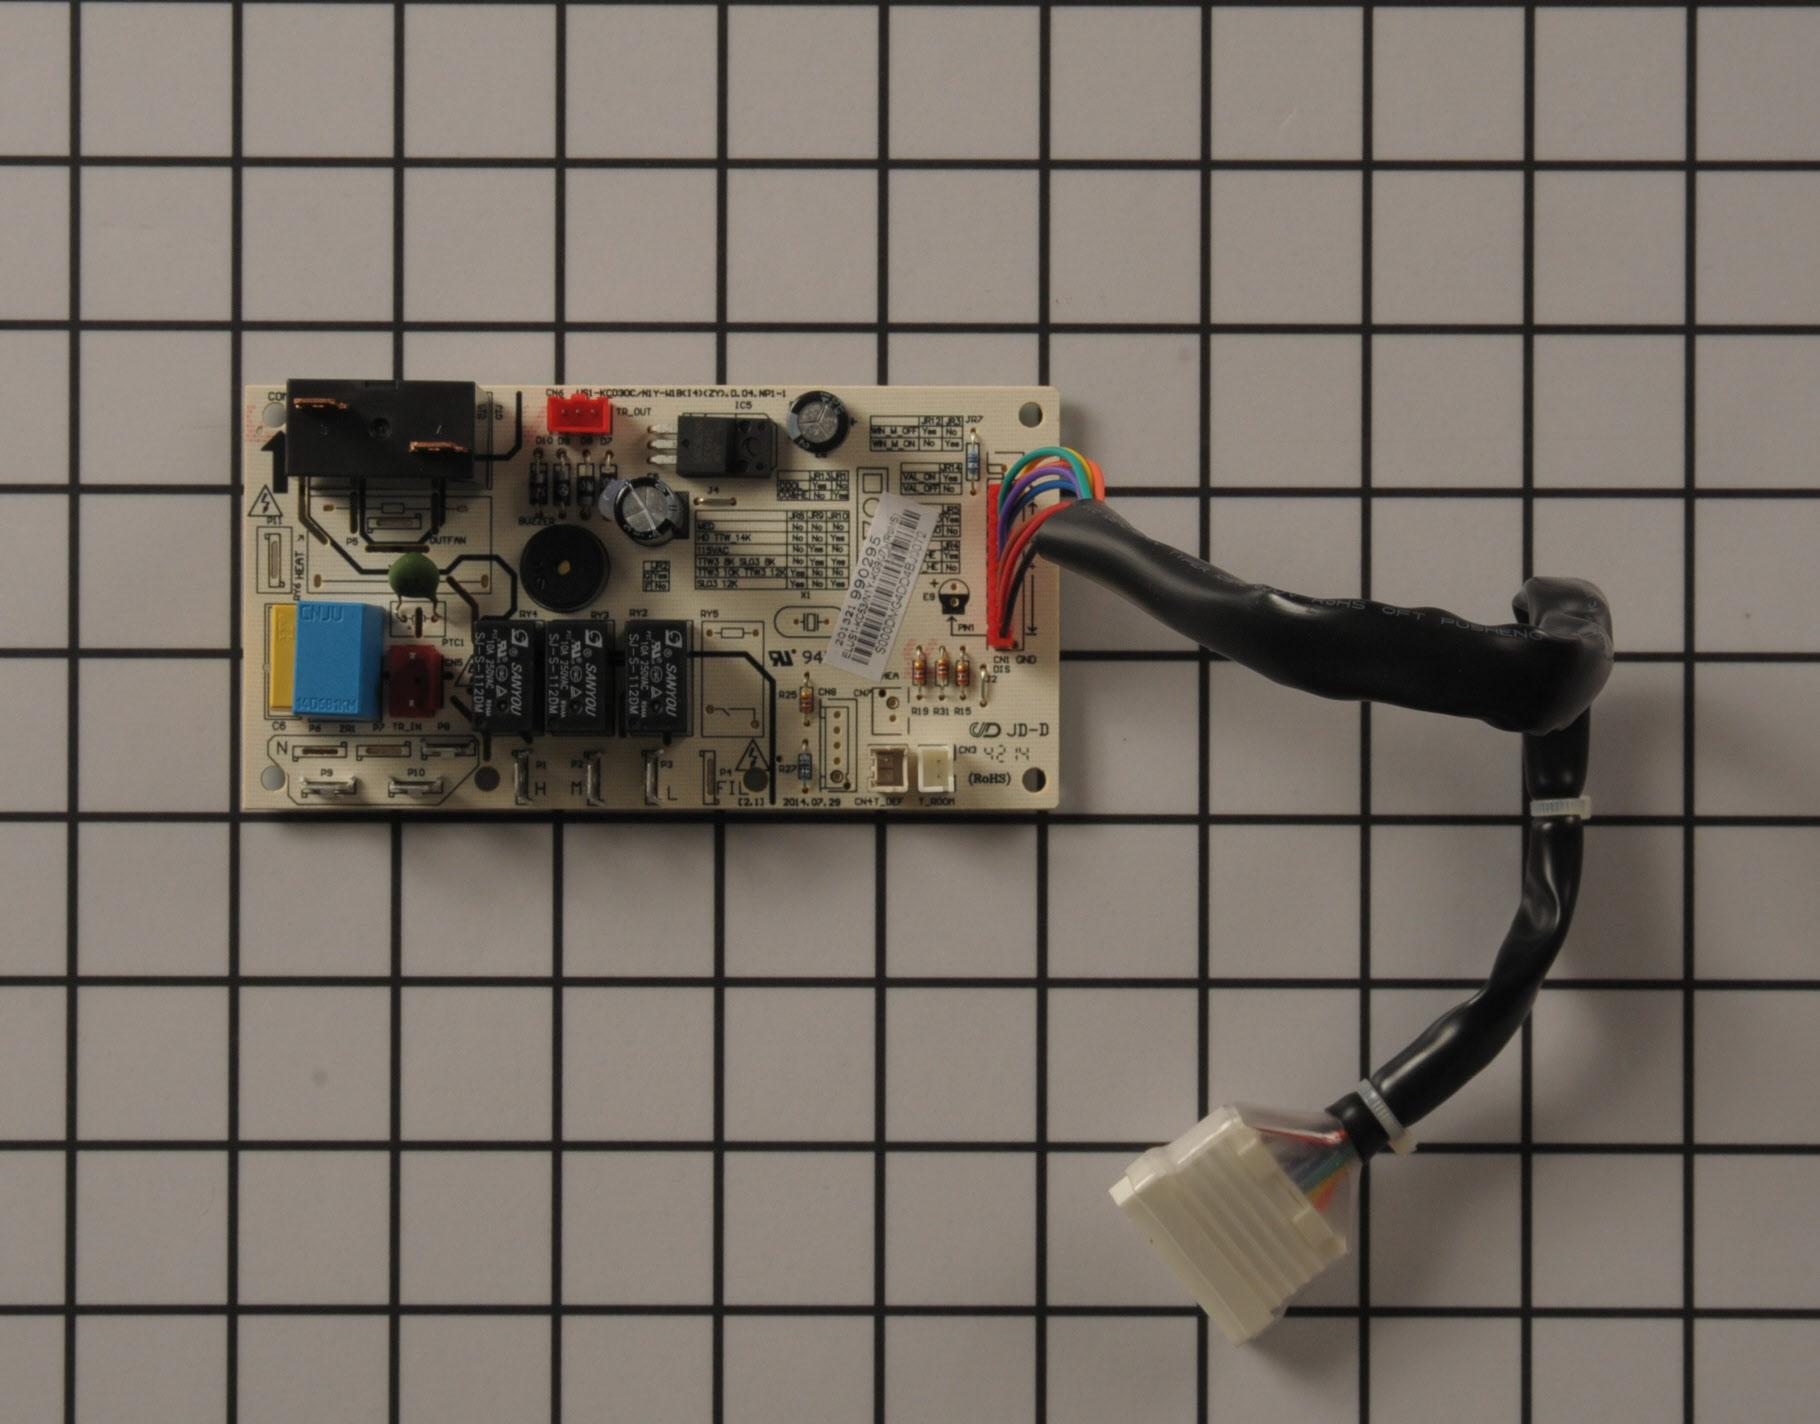 Frigidaire Air Conditioner Part # 5304495030 - Power Supply Board